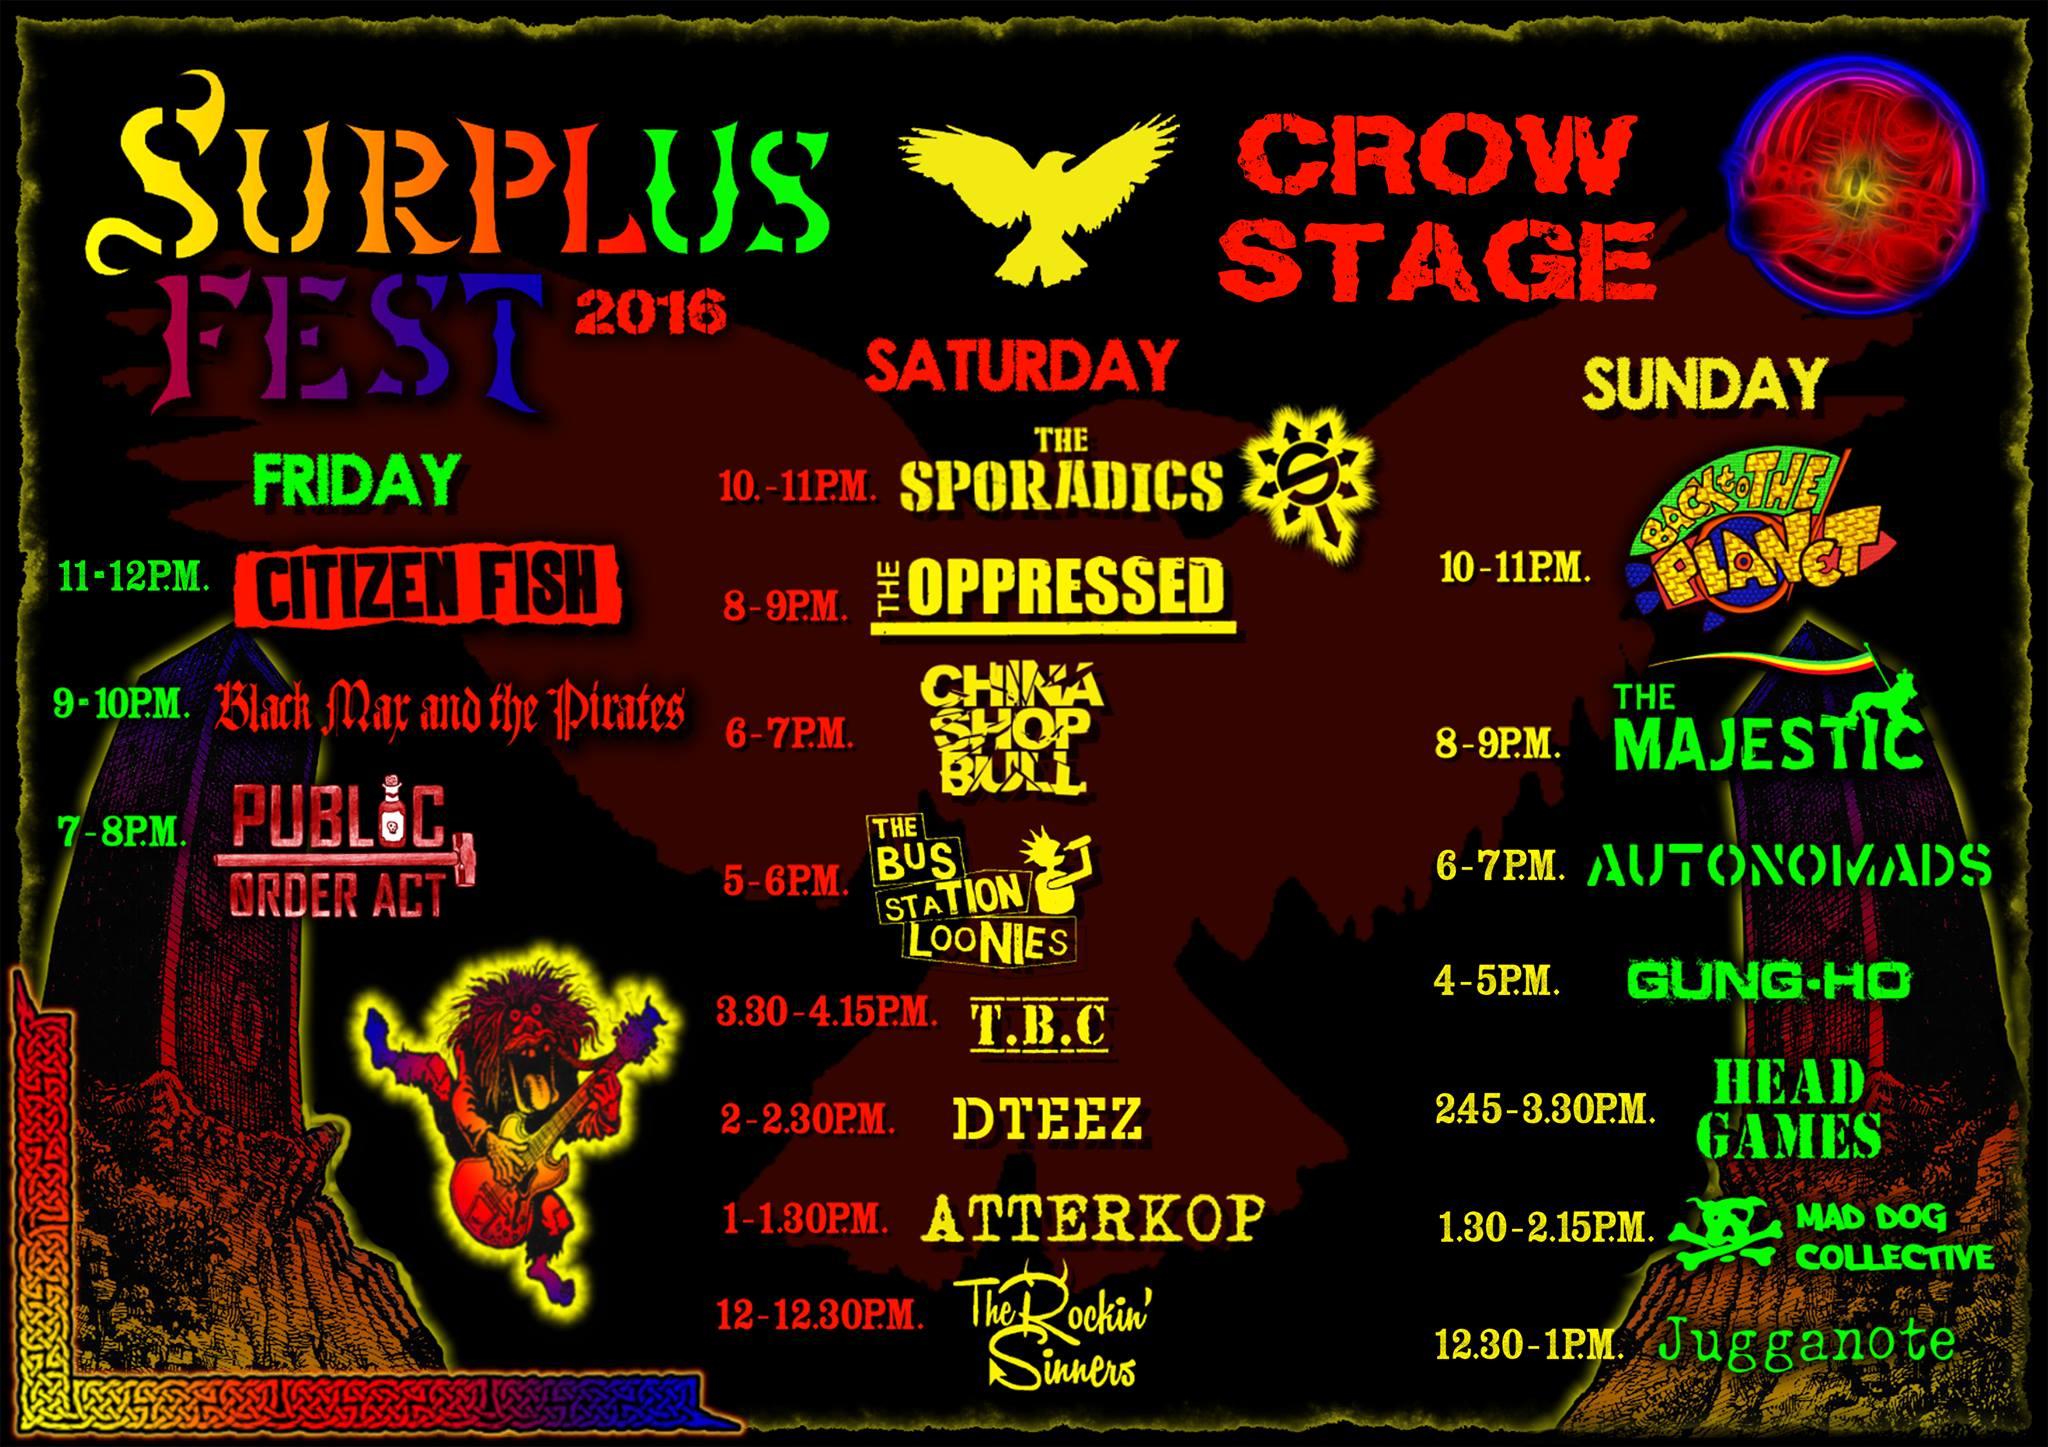 Permalink to: Surplus Festival 2016